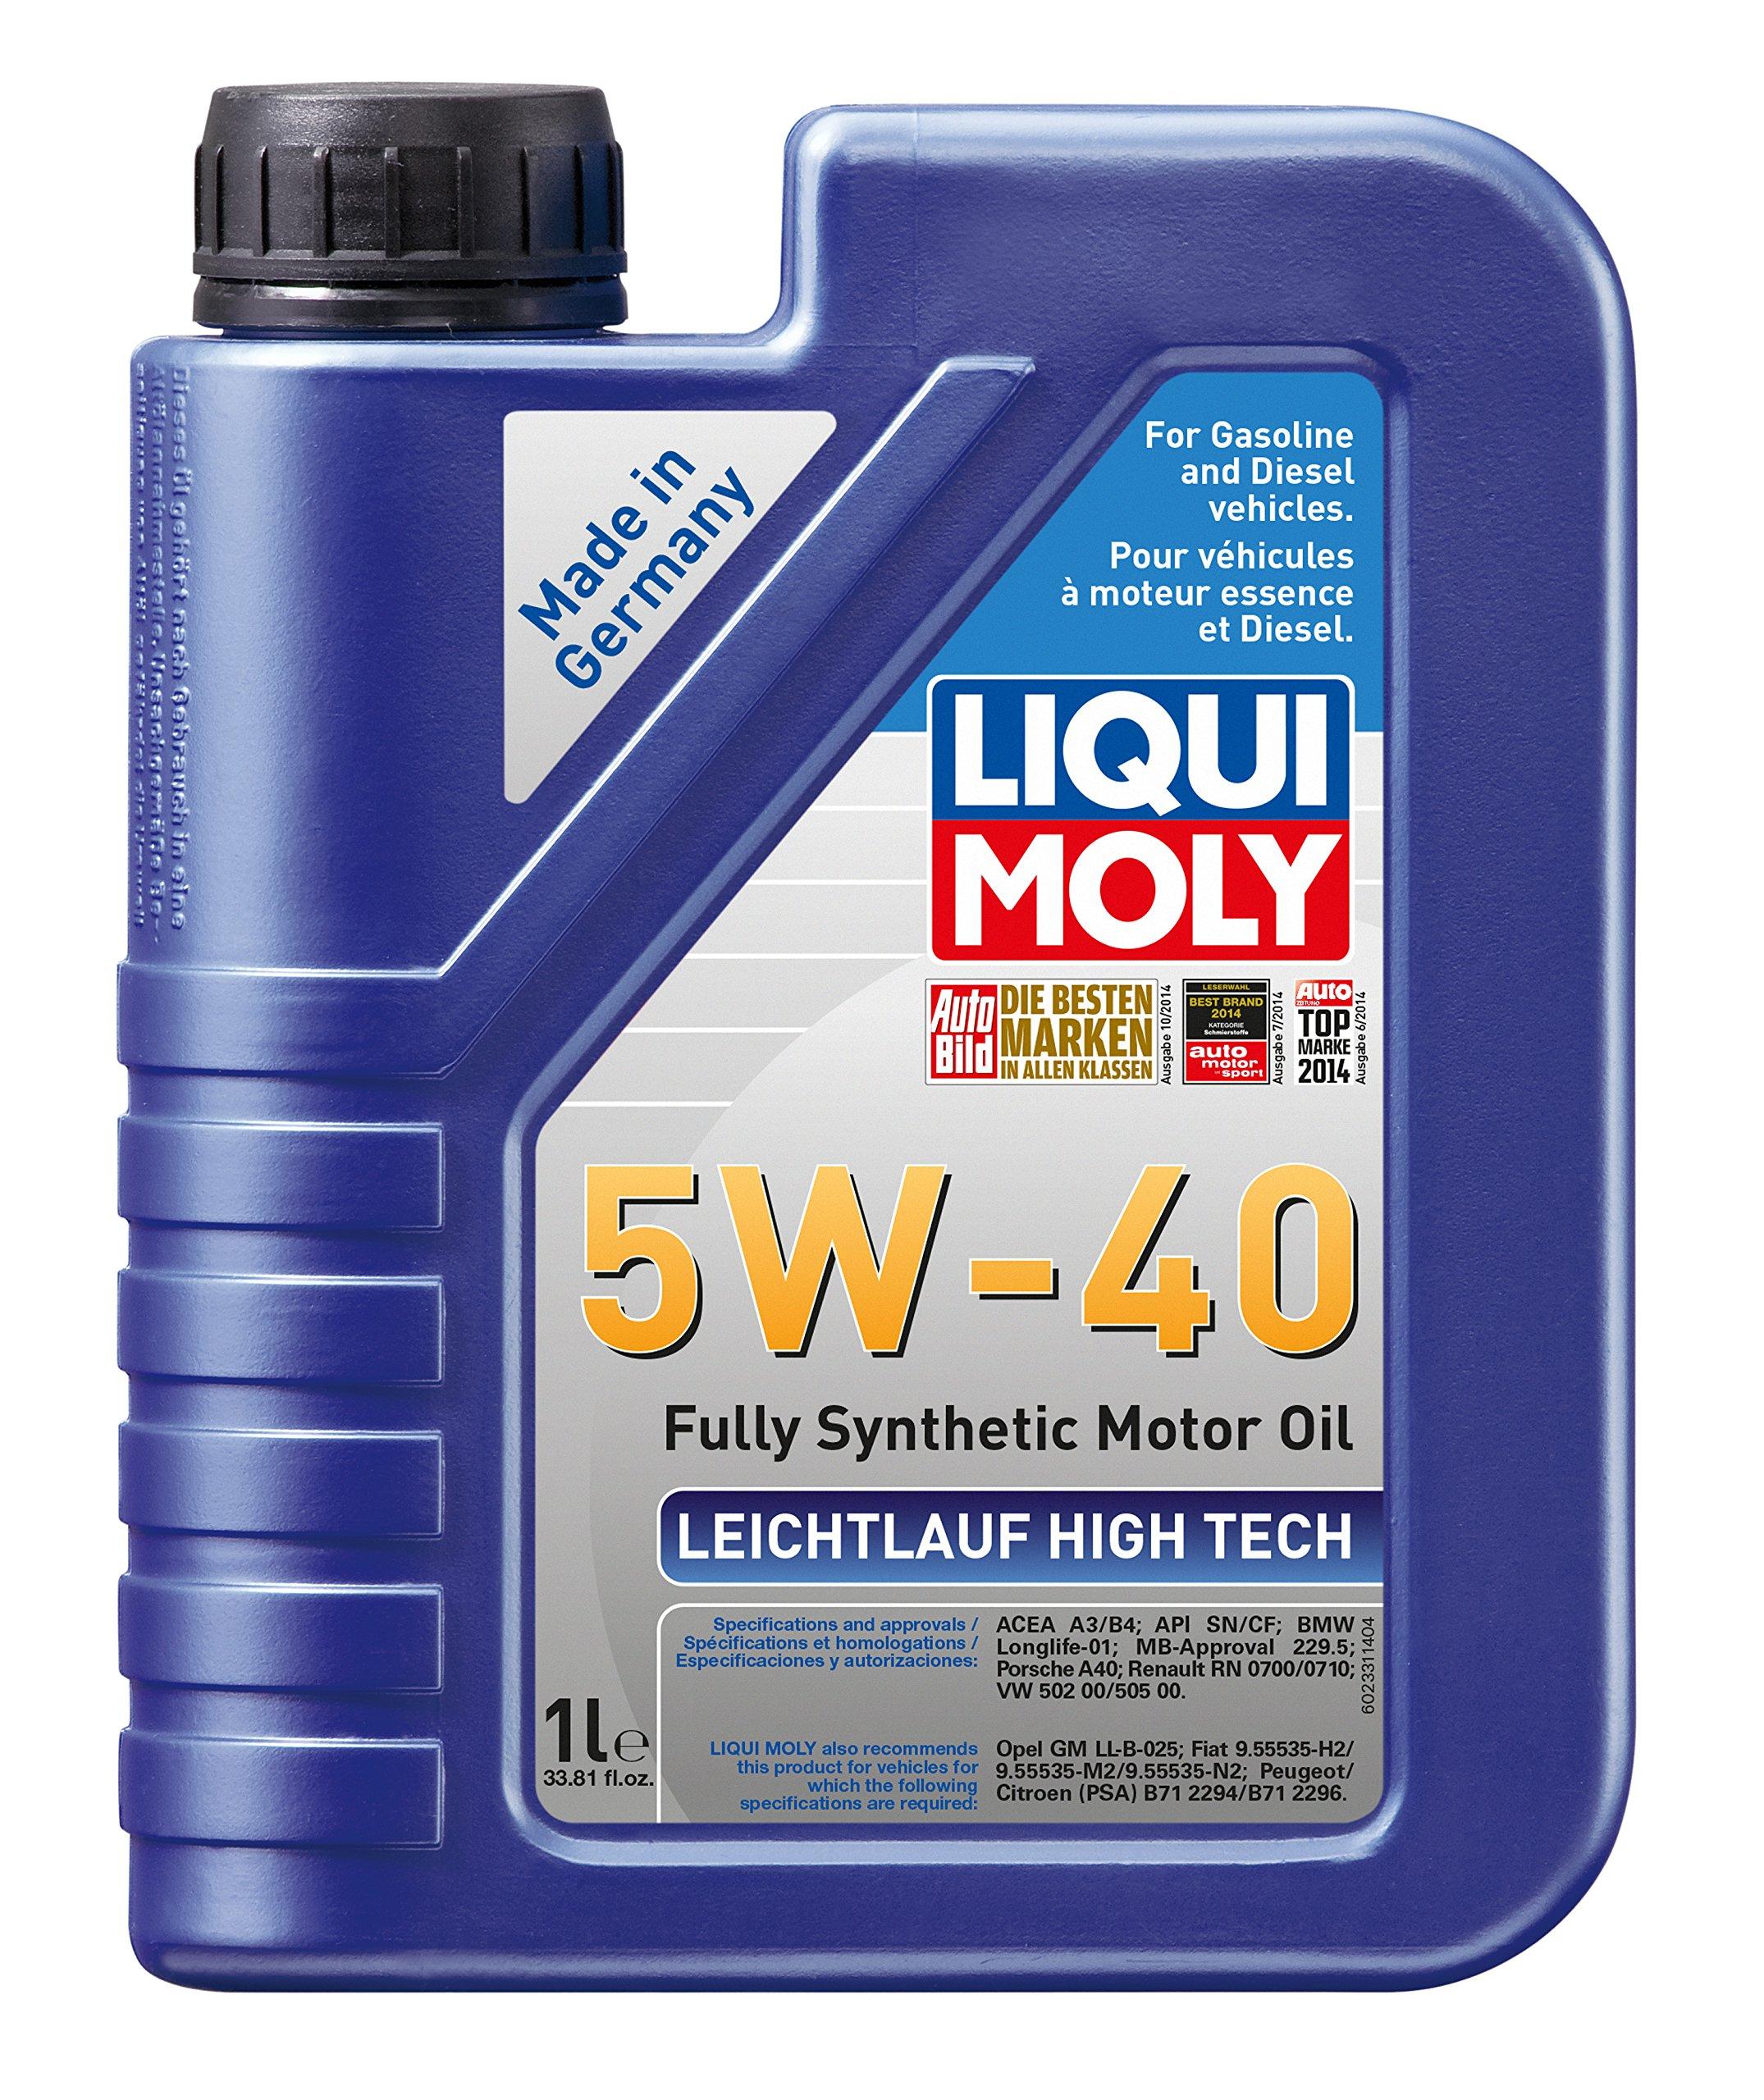 Liqui Moly 2331 Leichtlauf High Tech 5W-40 Engine Oil - 1 Liter by Liqui Moly